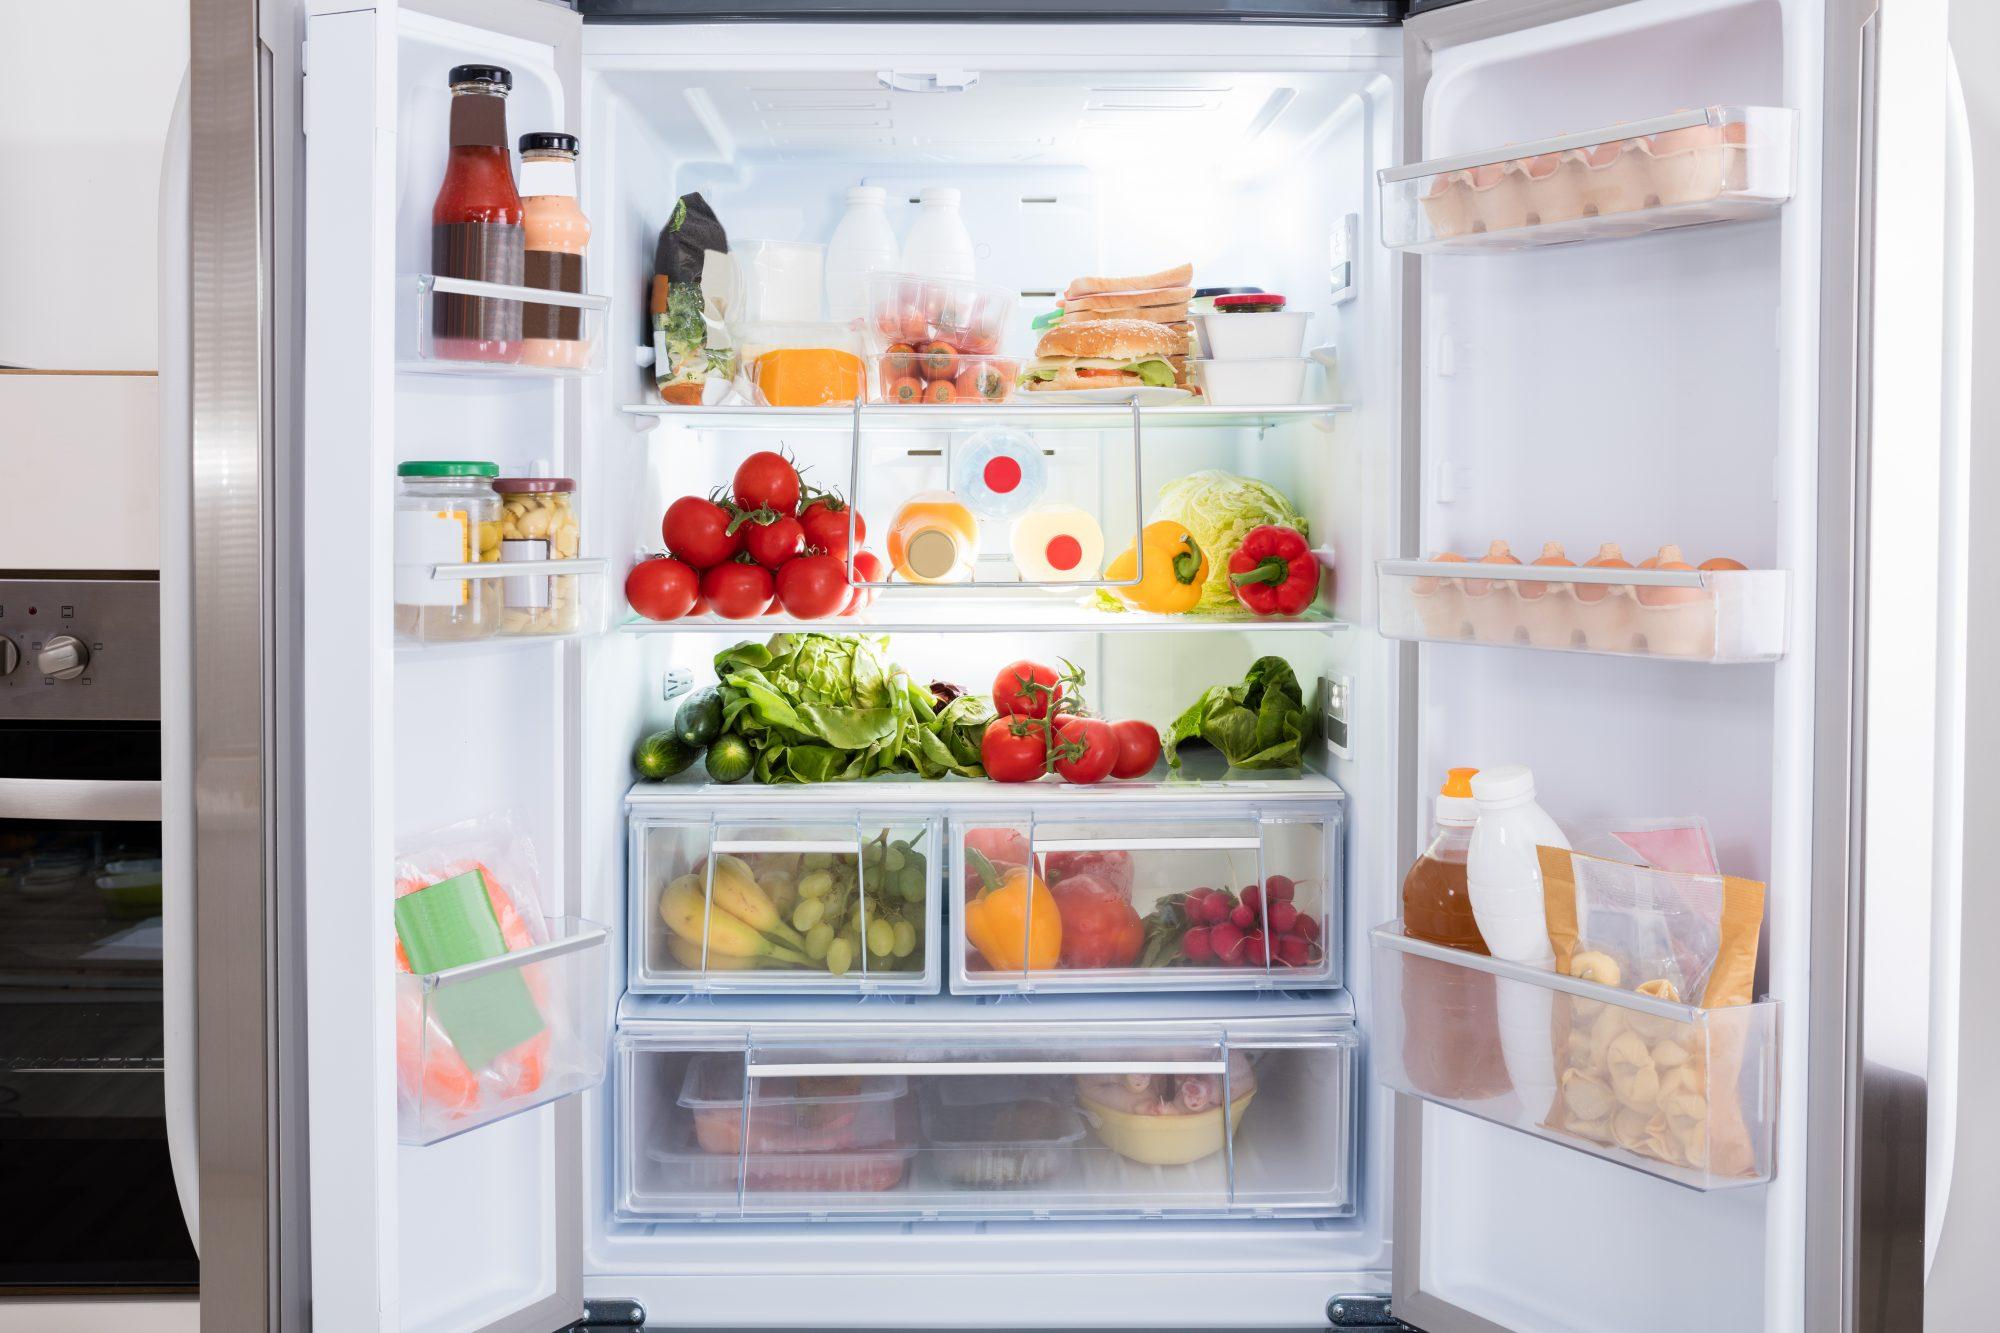 082420_Open Refrigerator